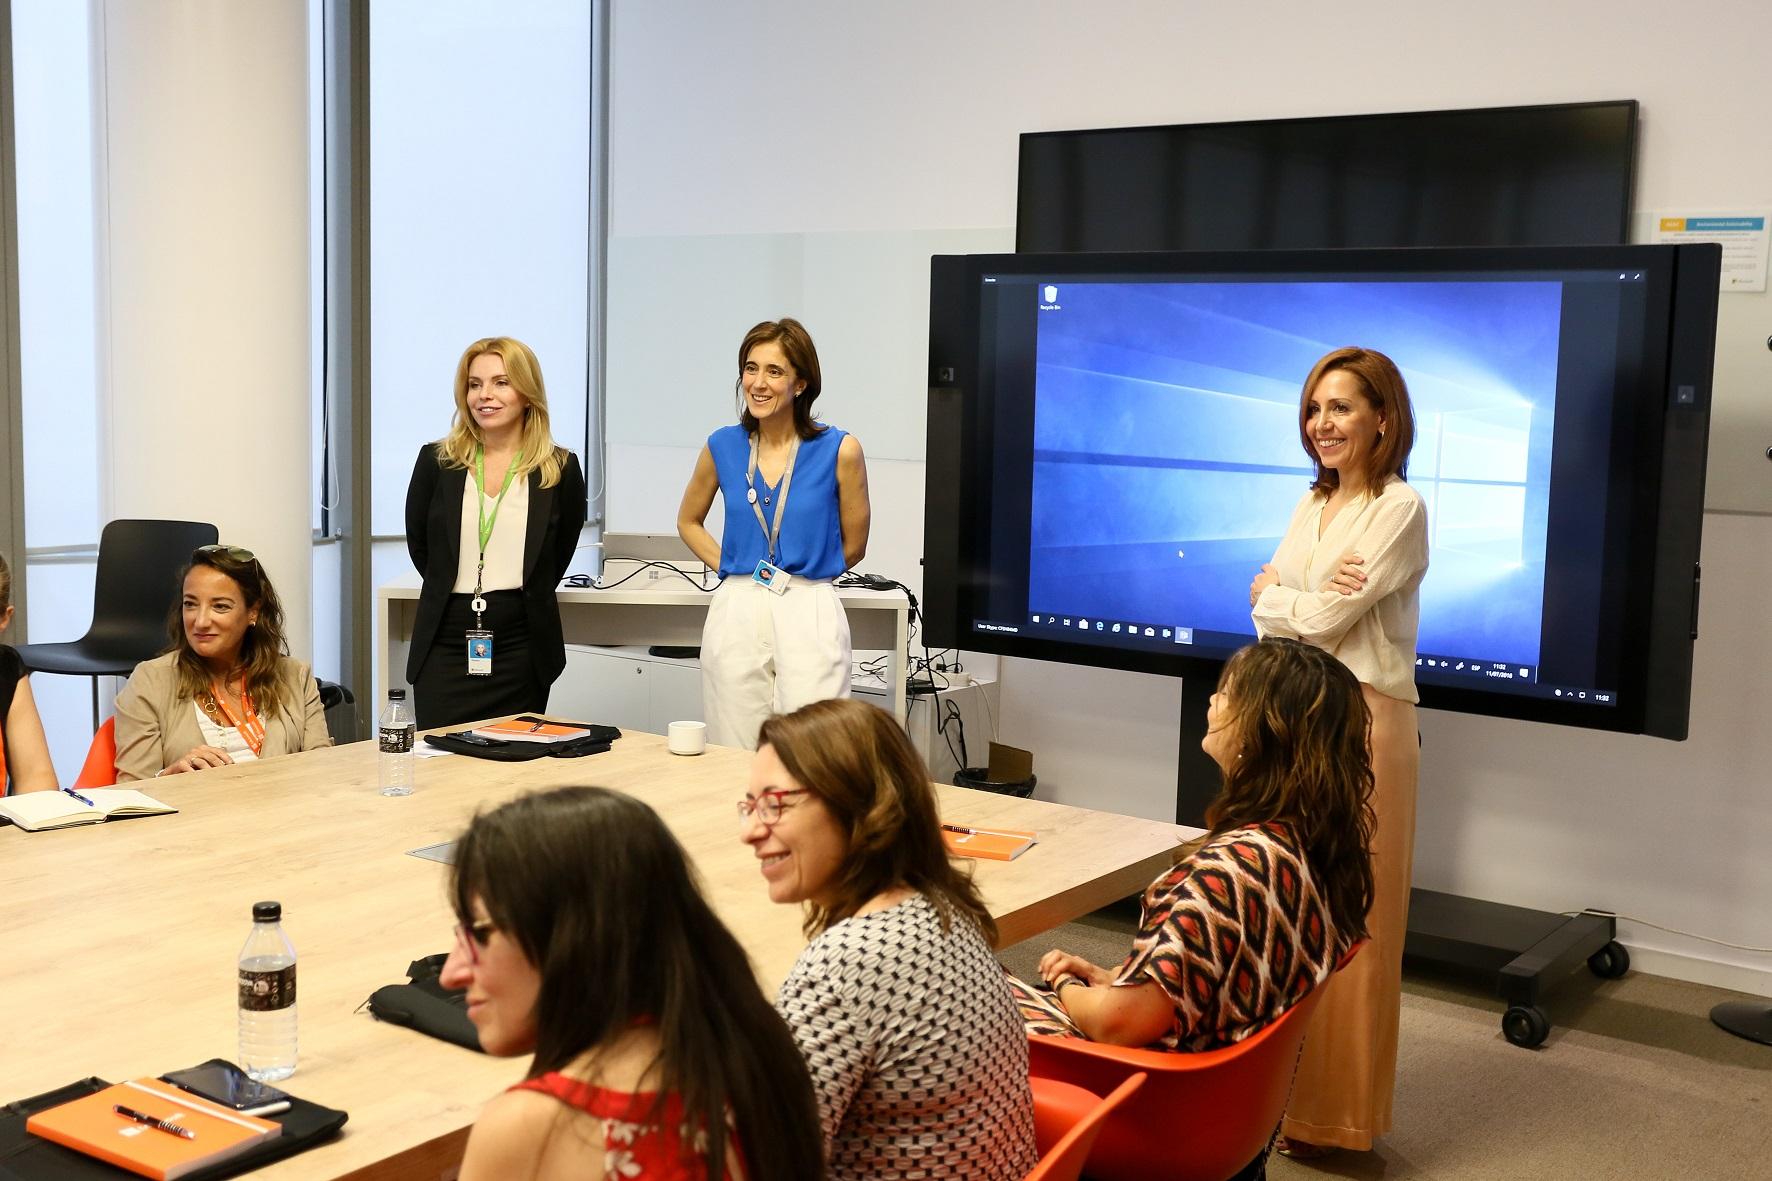 Women in Cibersecurity of Spain (2). Karen Gaines, Pilar López y Ana Alonso - Microsoft